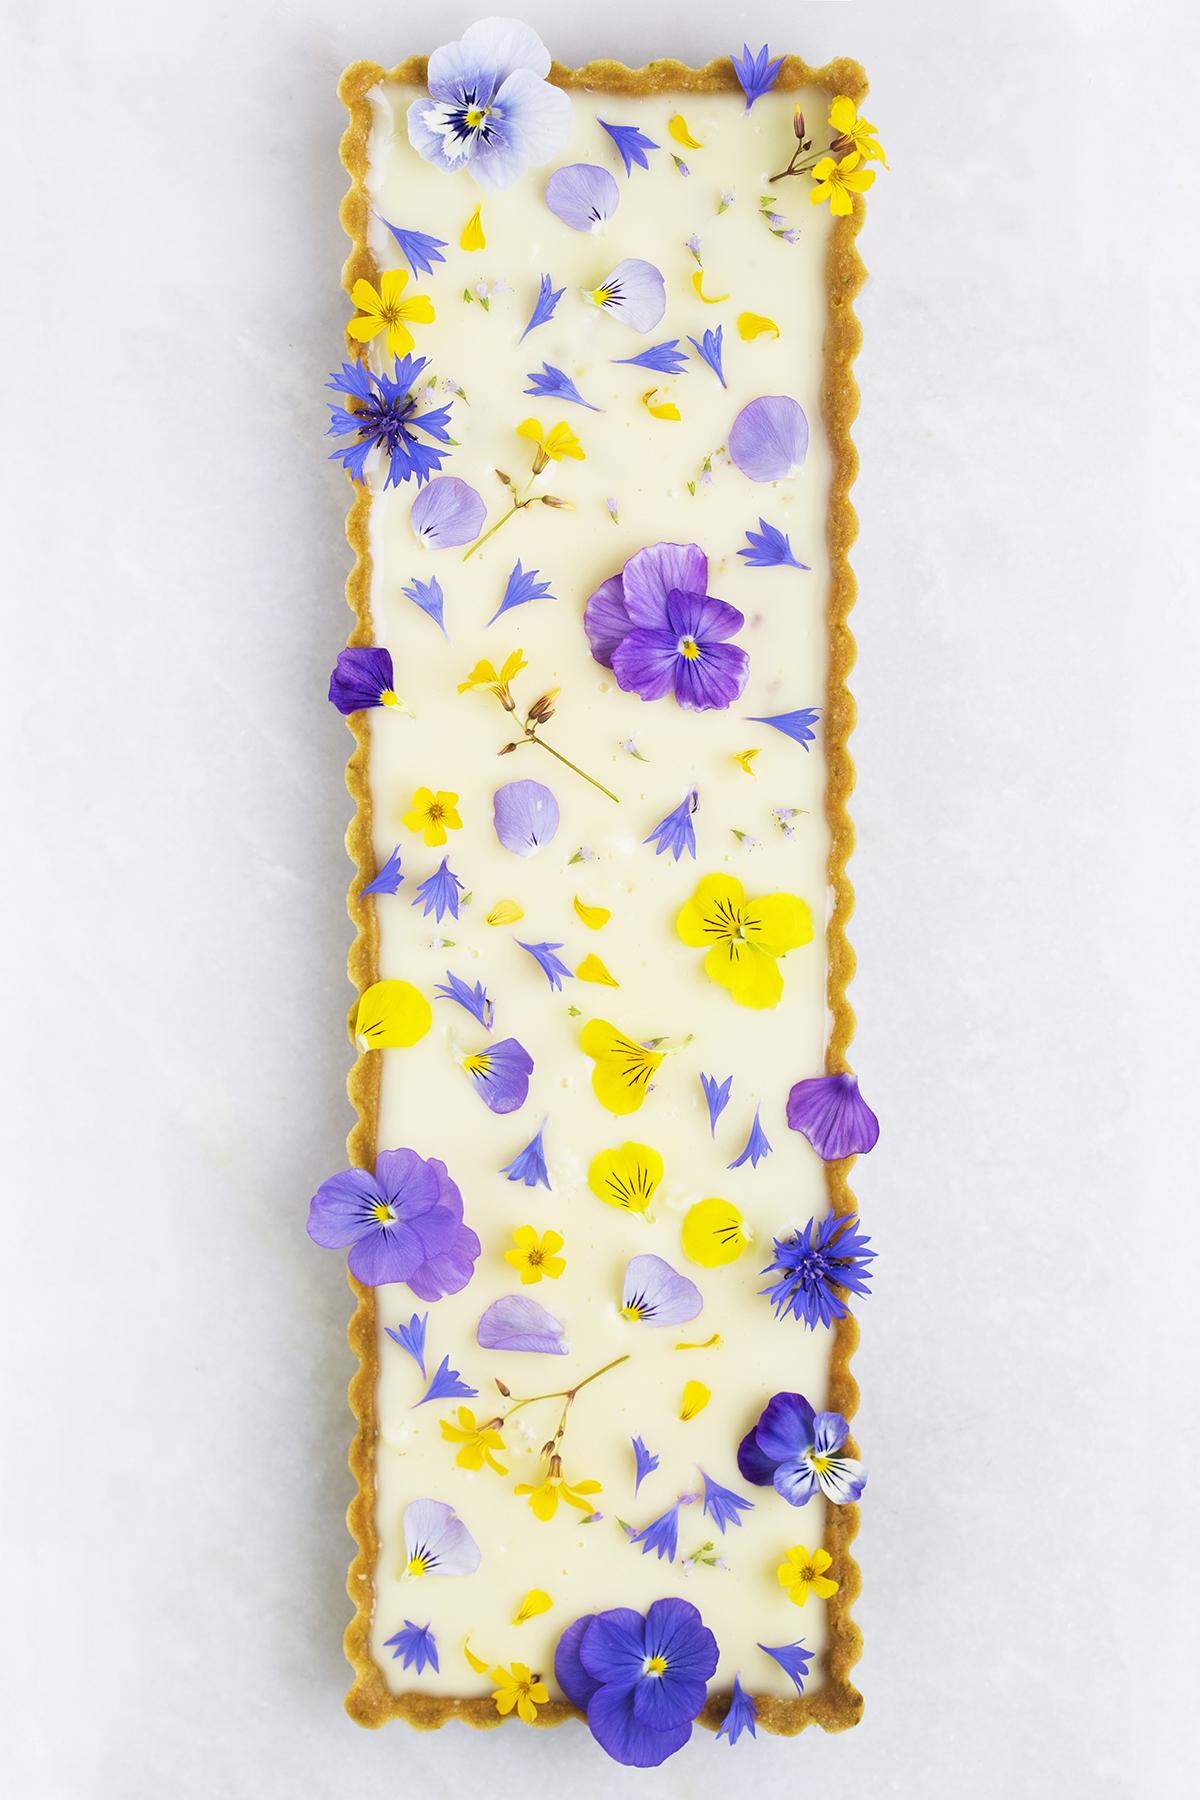 Blomstertærte rabarber frangipane pistacie